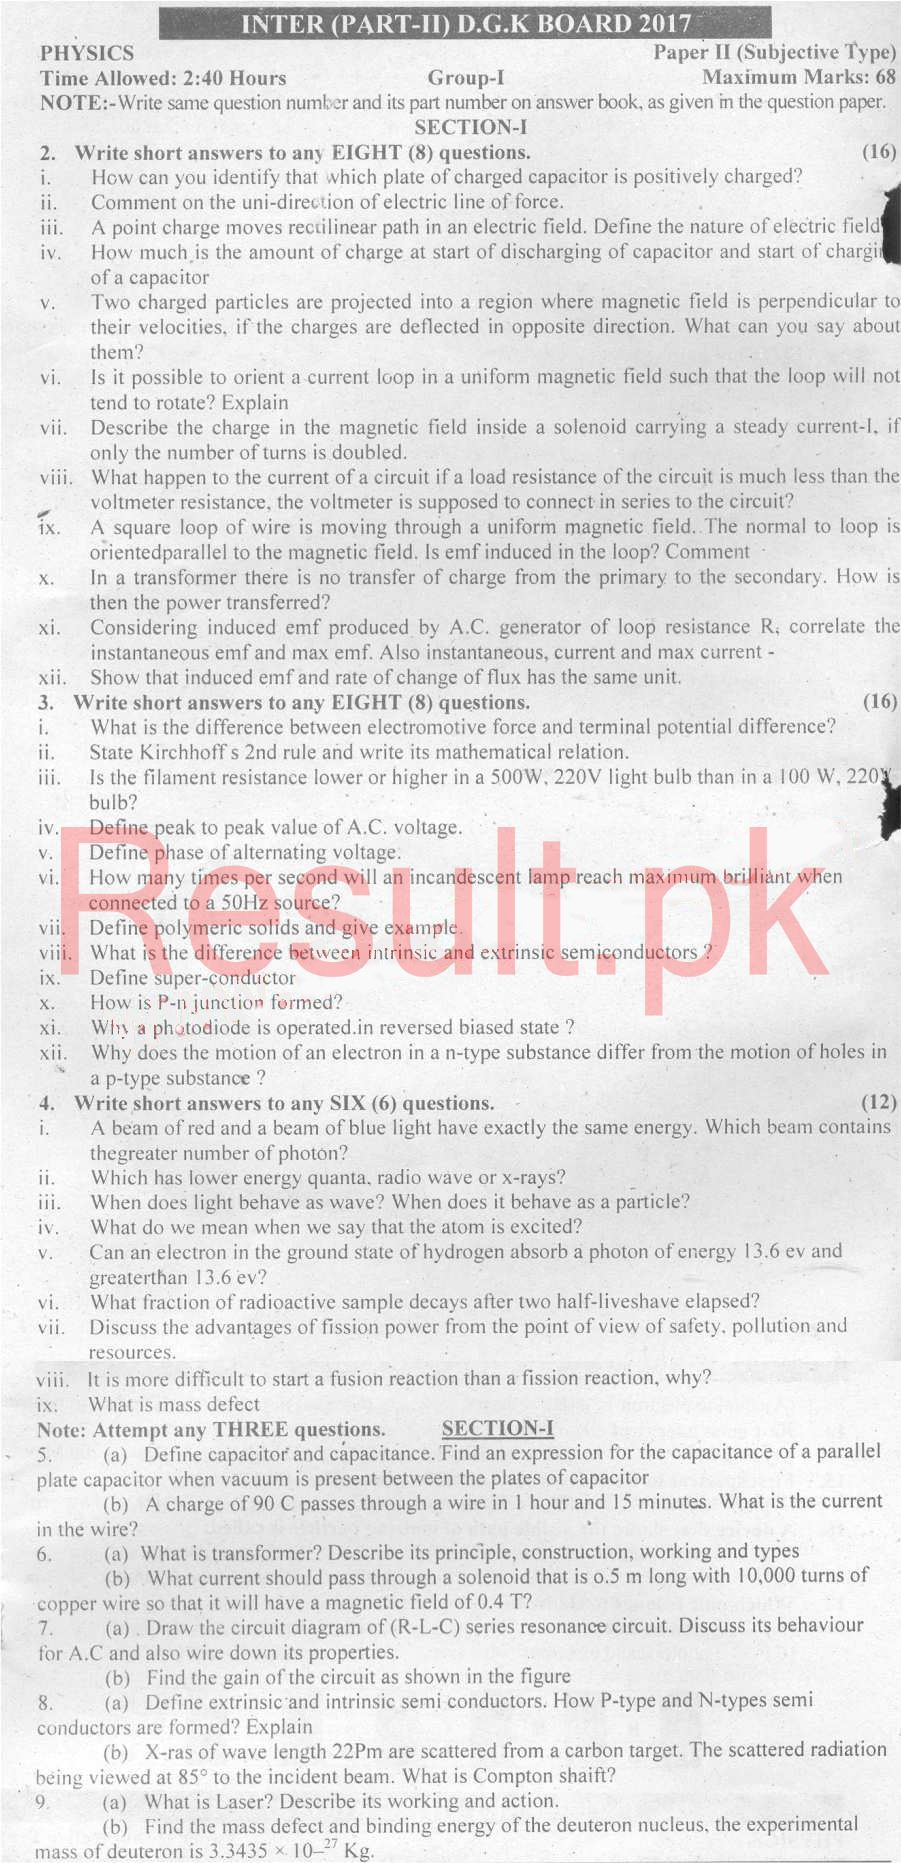 BISE DG Khan Board Past Papers 2018 Inter Part 1 2, FA, HSSC